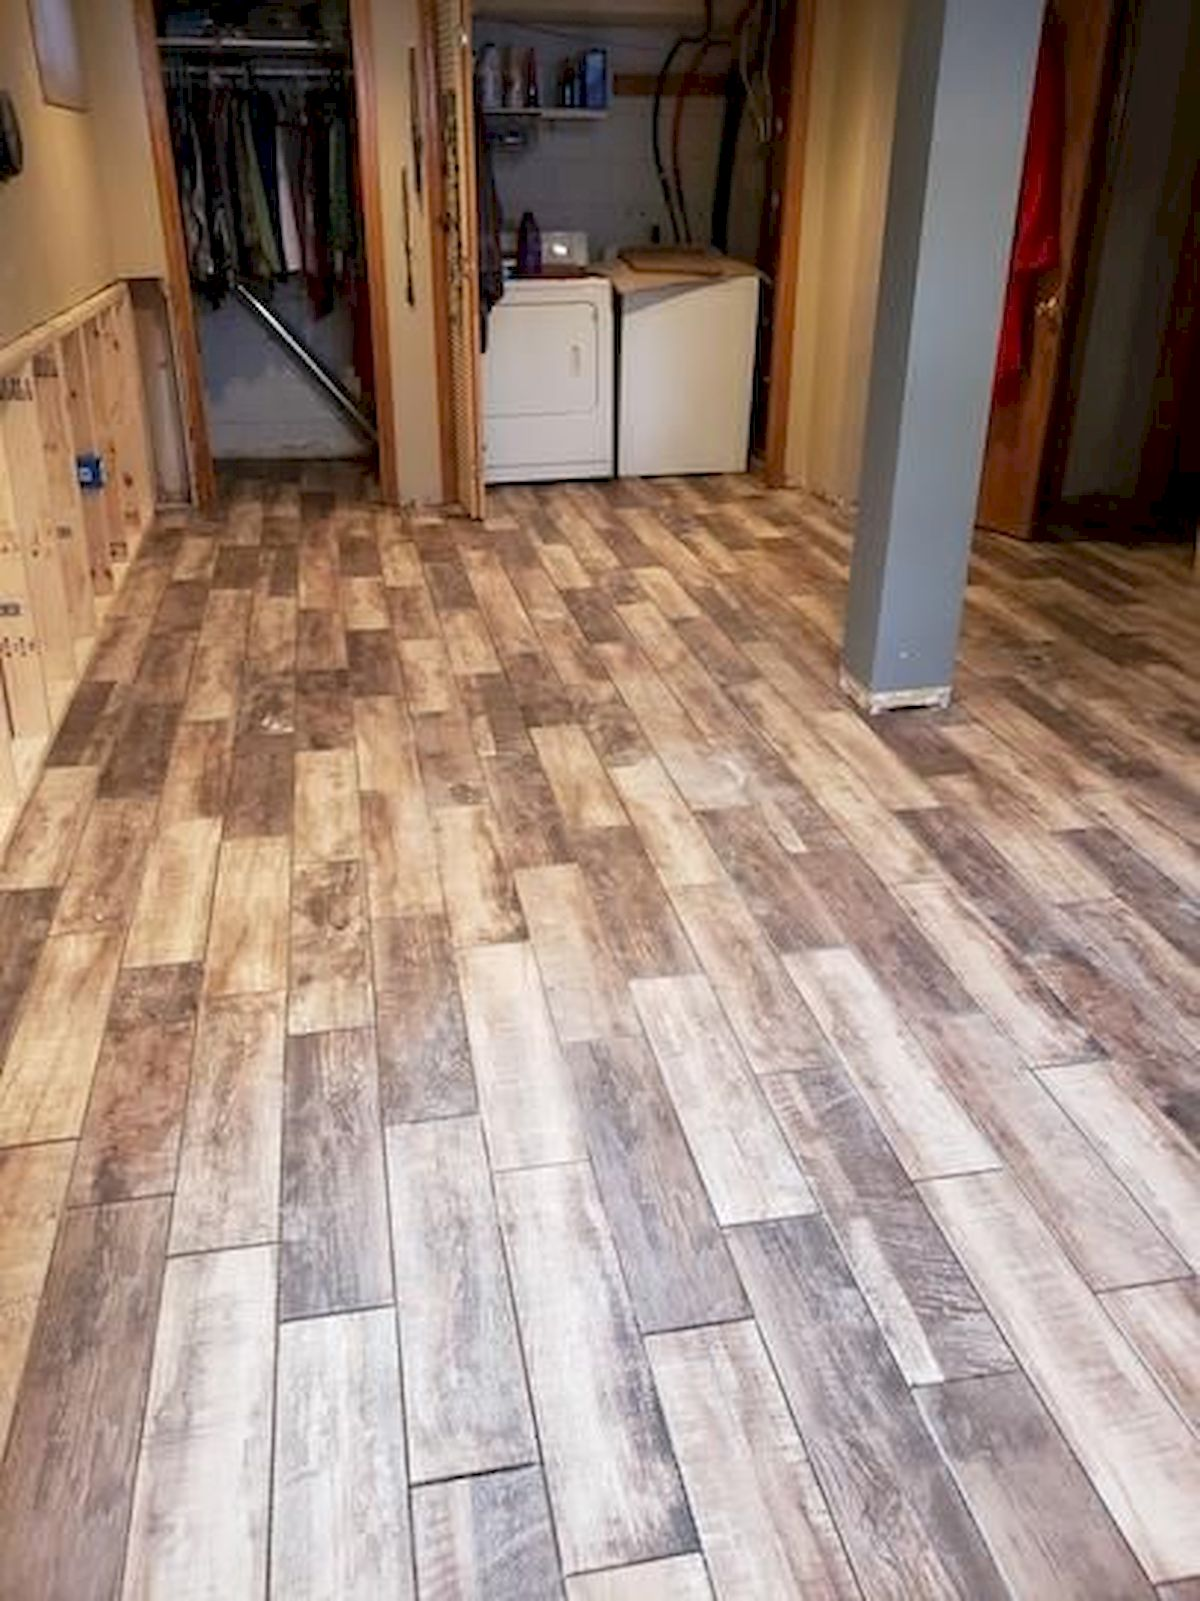 80 Gorgeous Hardwood Floor Ideas for Interior Home (15)